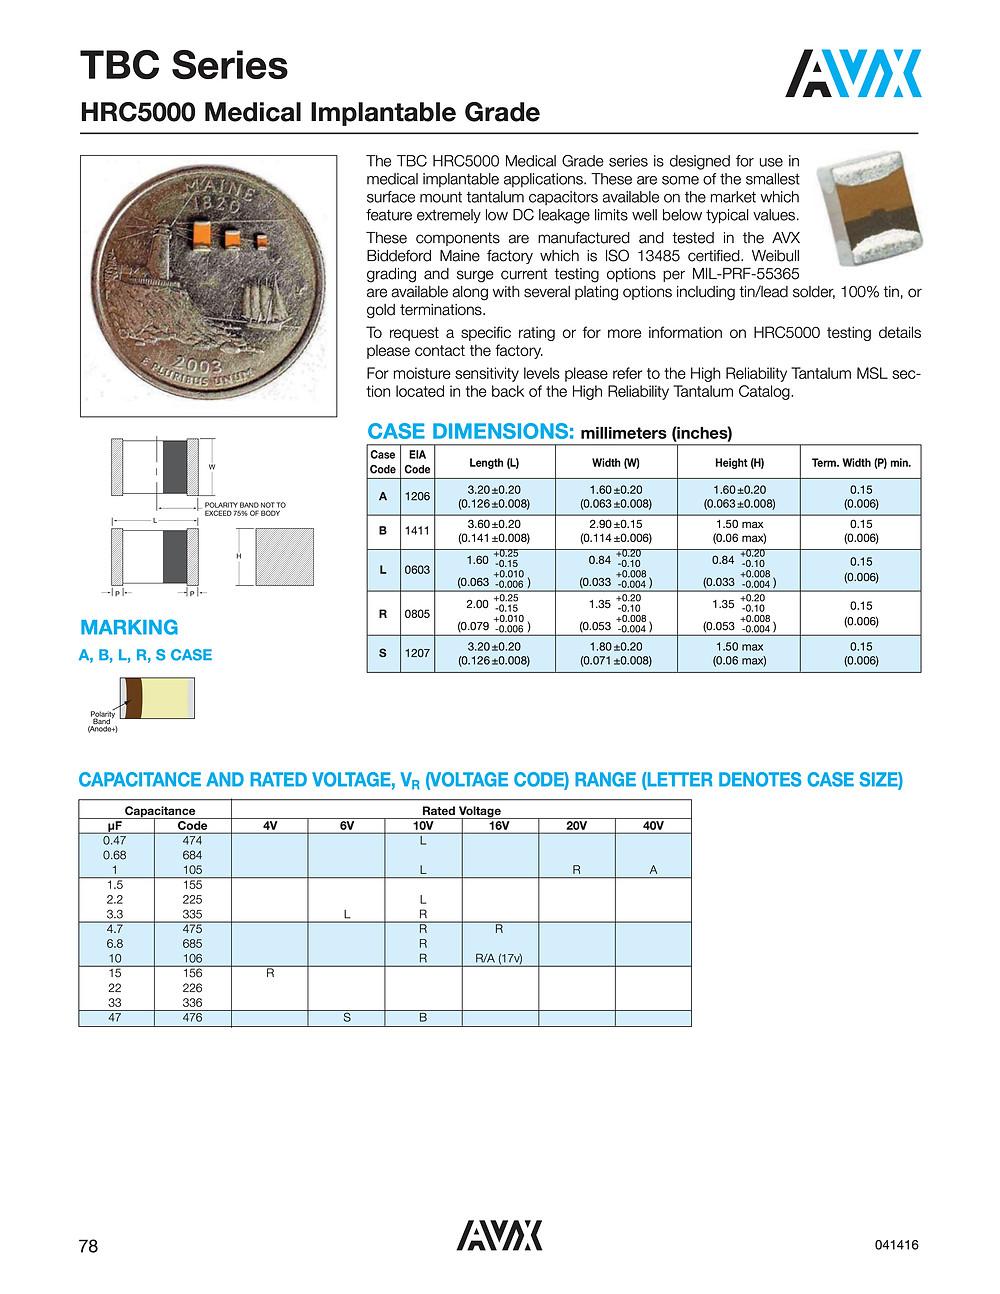 AVX TBC HRC5000 Series Capacitor